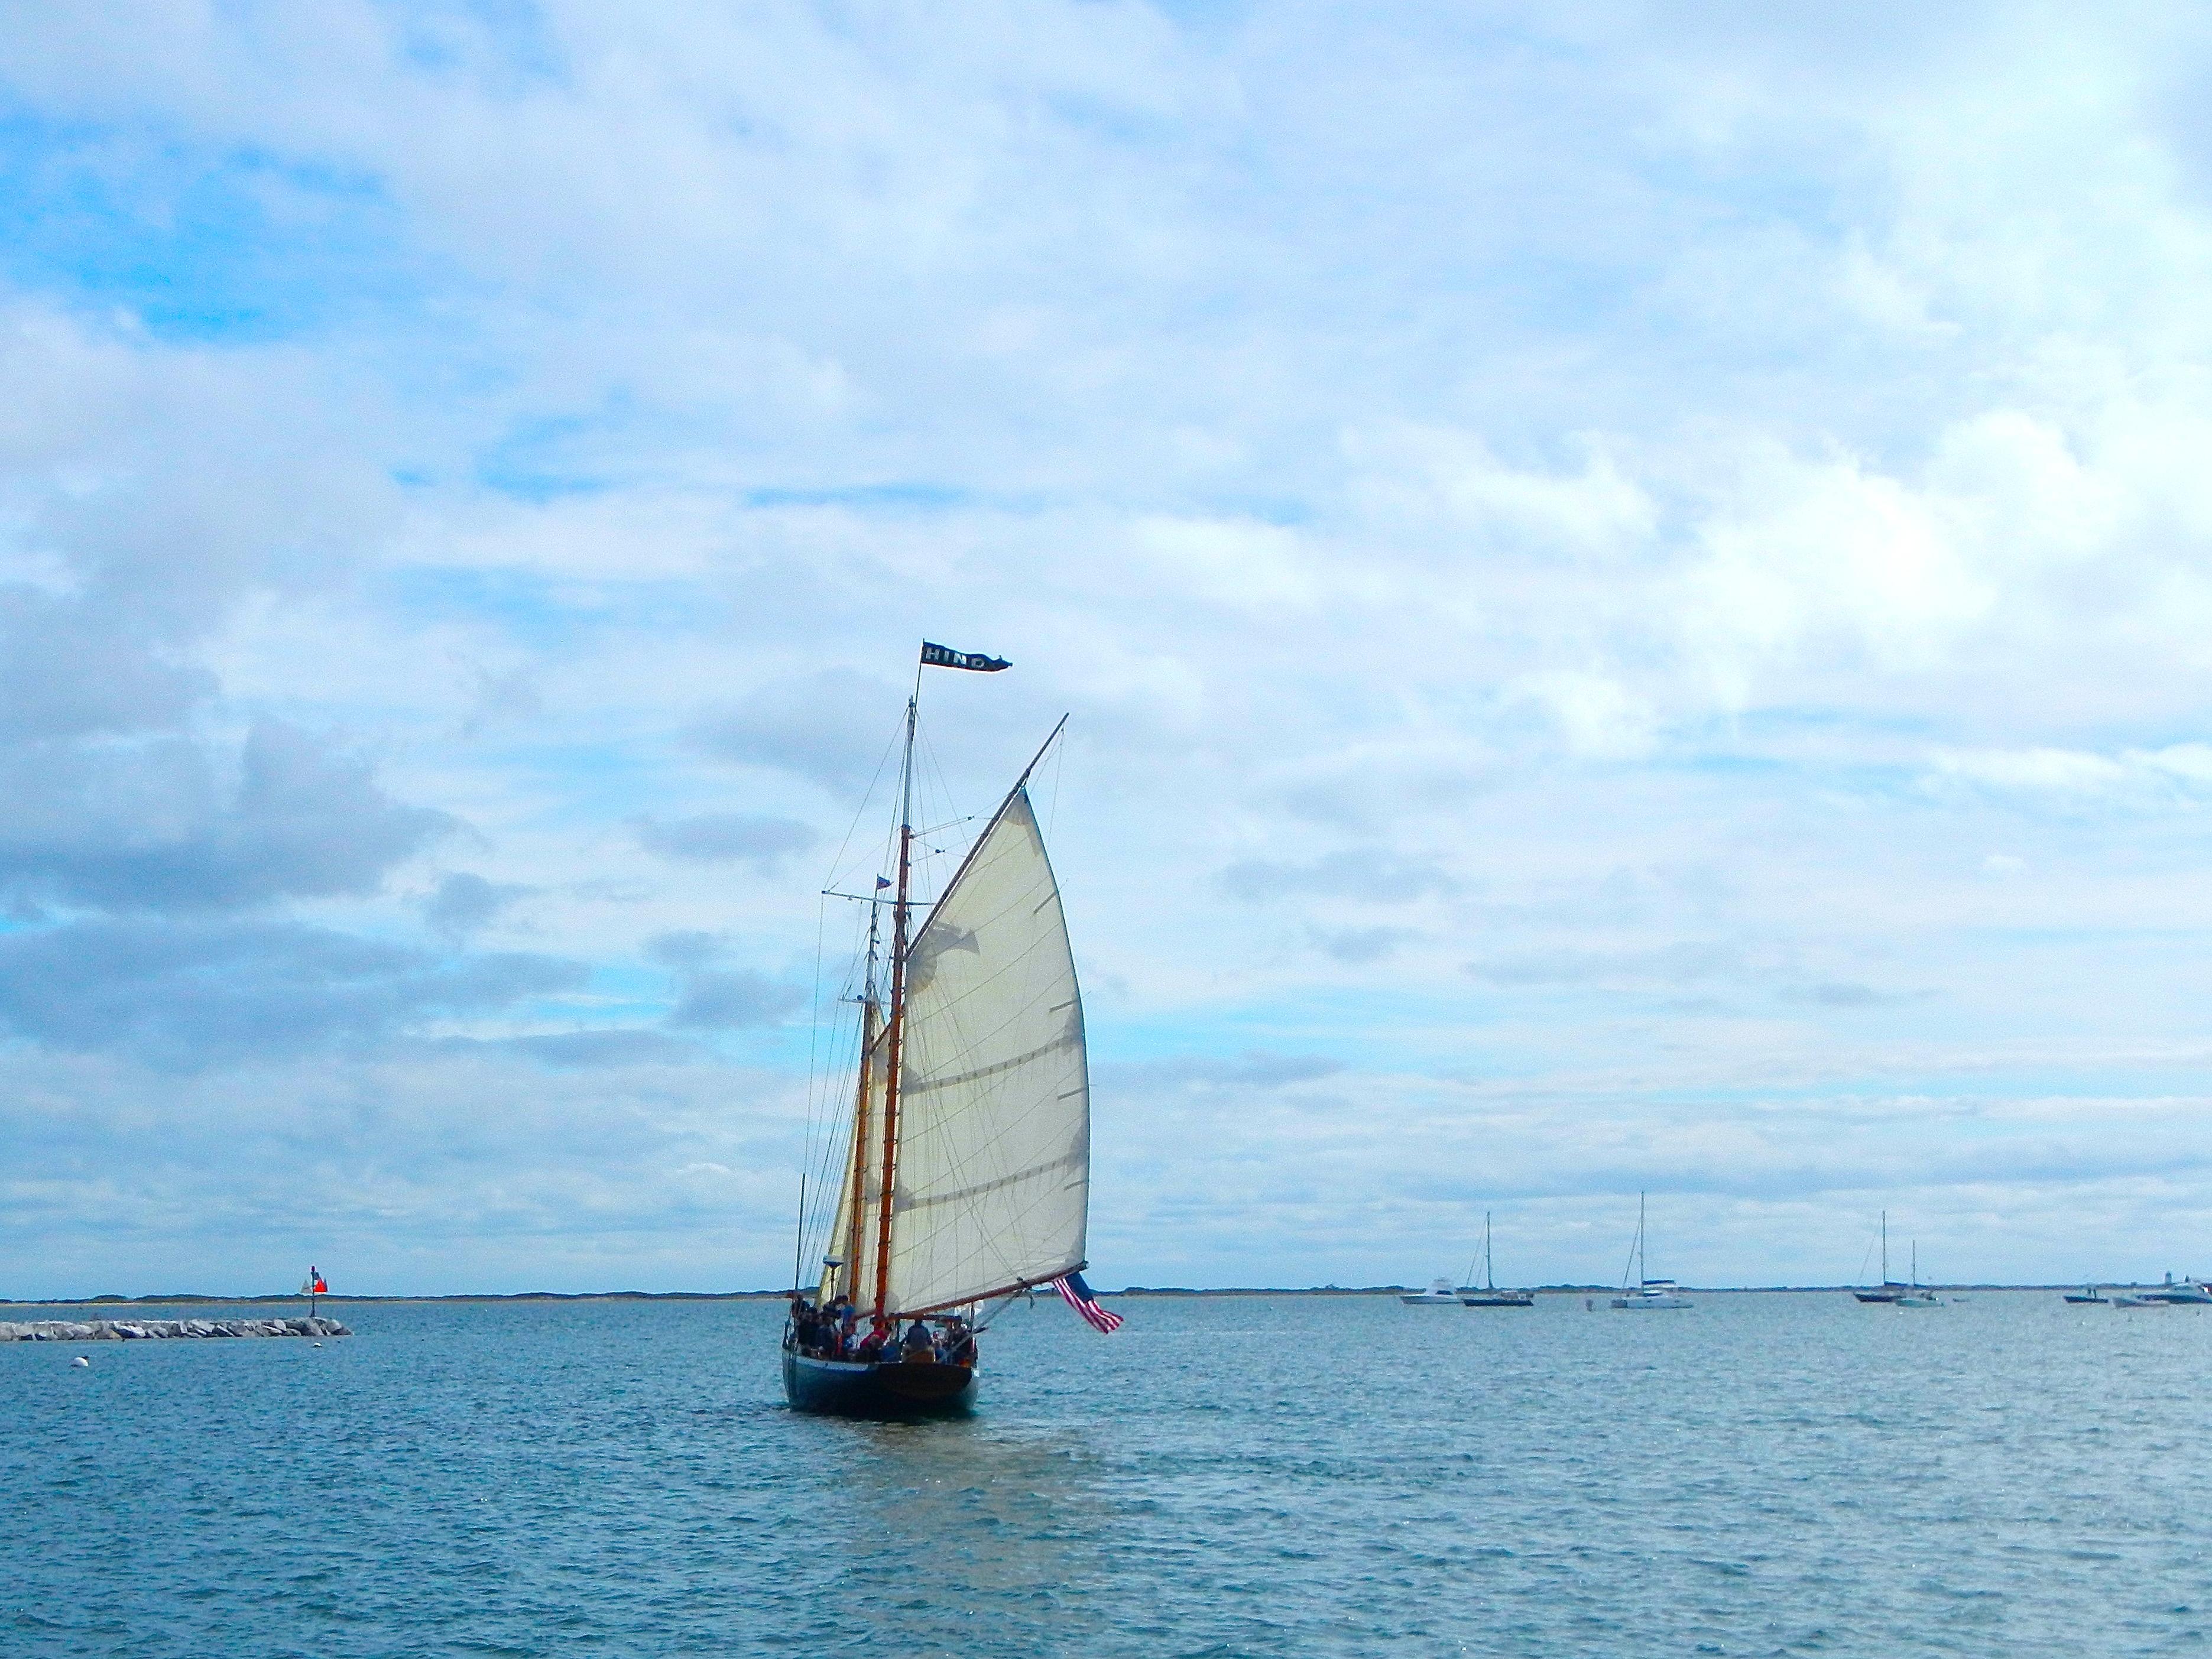 Sailing Ship leaving Provincetown